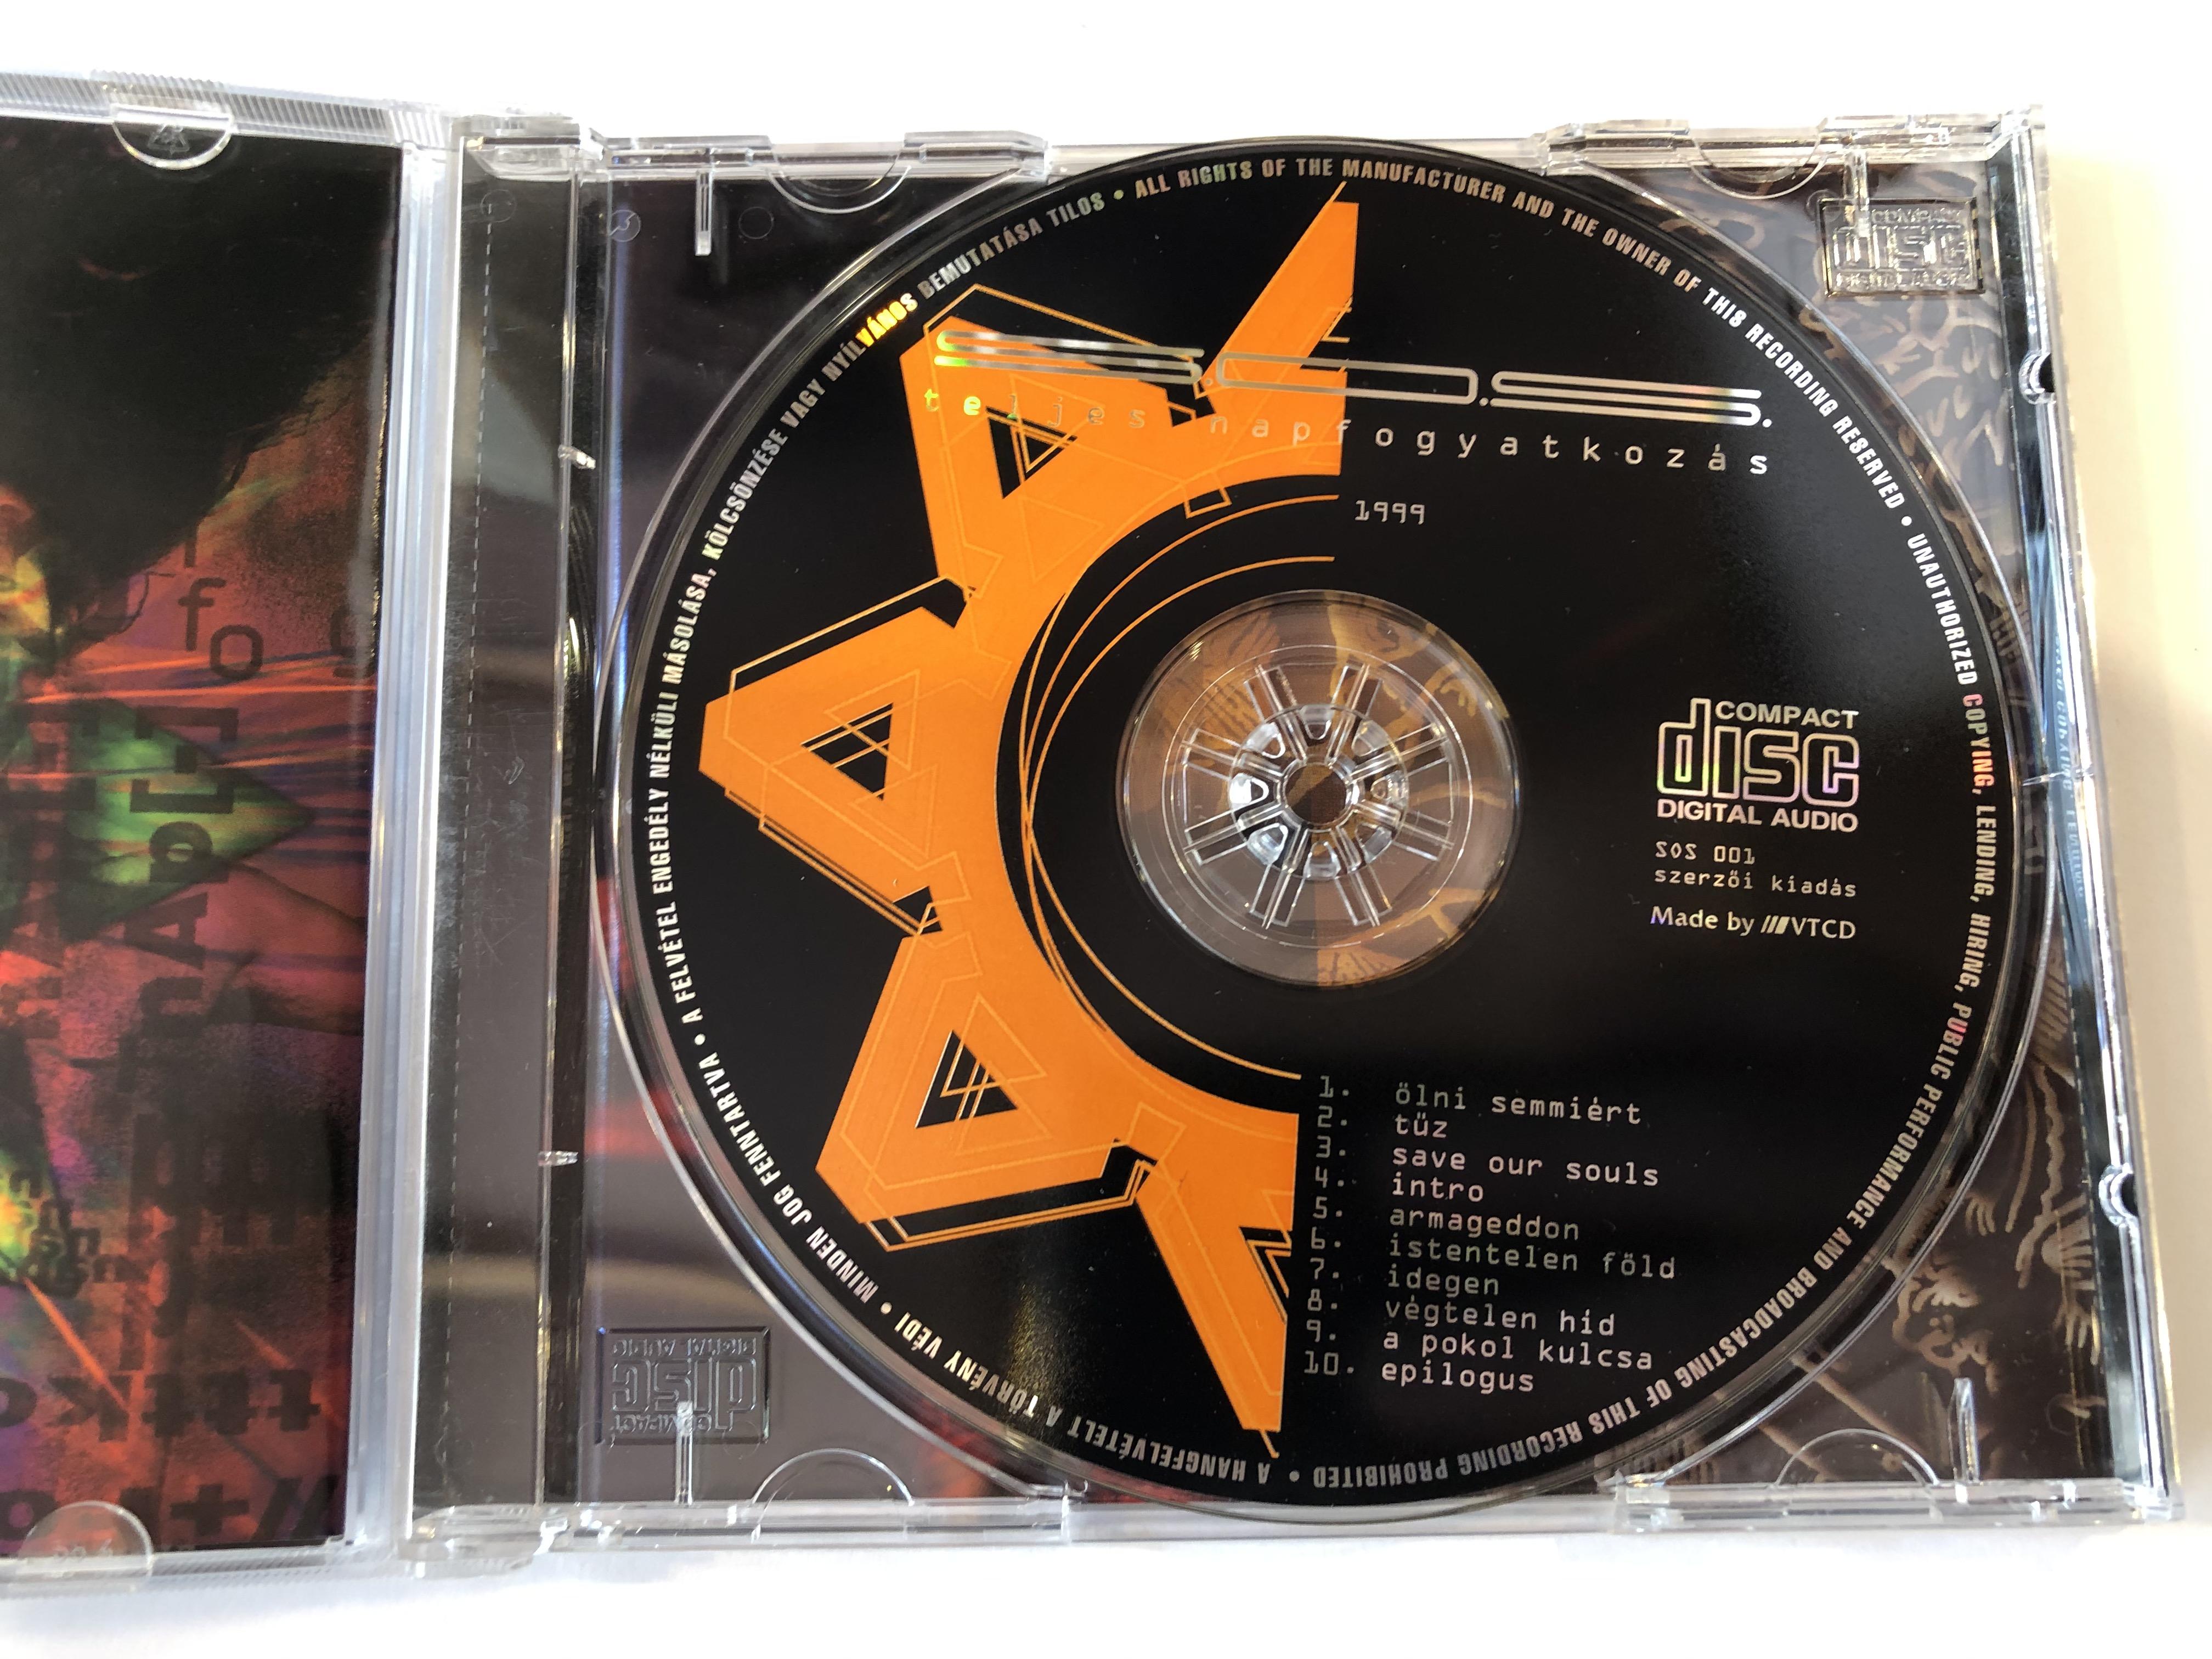 s.o.s.-teljes-napfogyatkoz-s-audio-cd-sos-001-2-.jpg